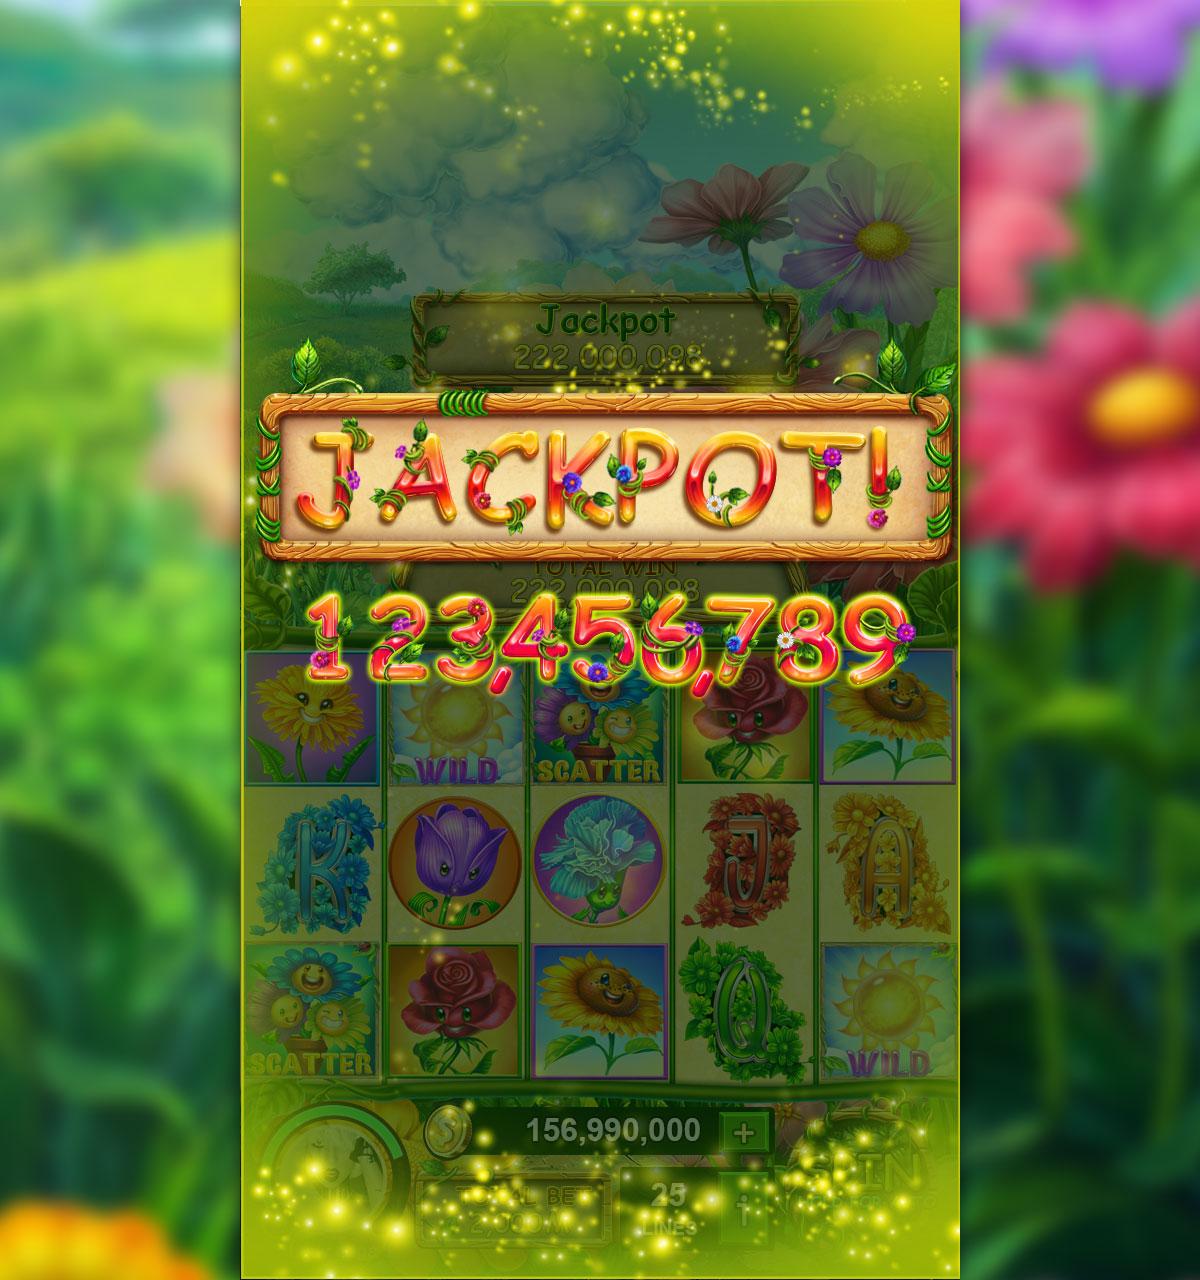 blossom_paradise_blog_jackpot